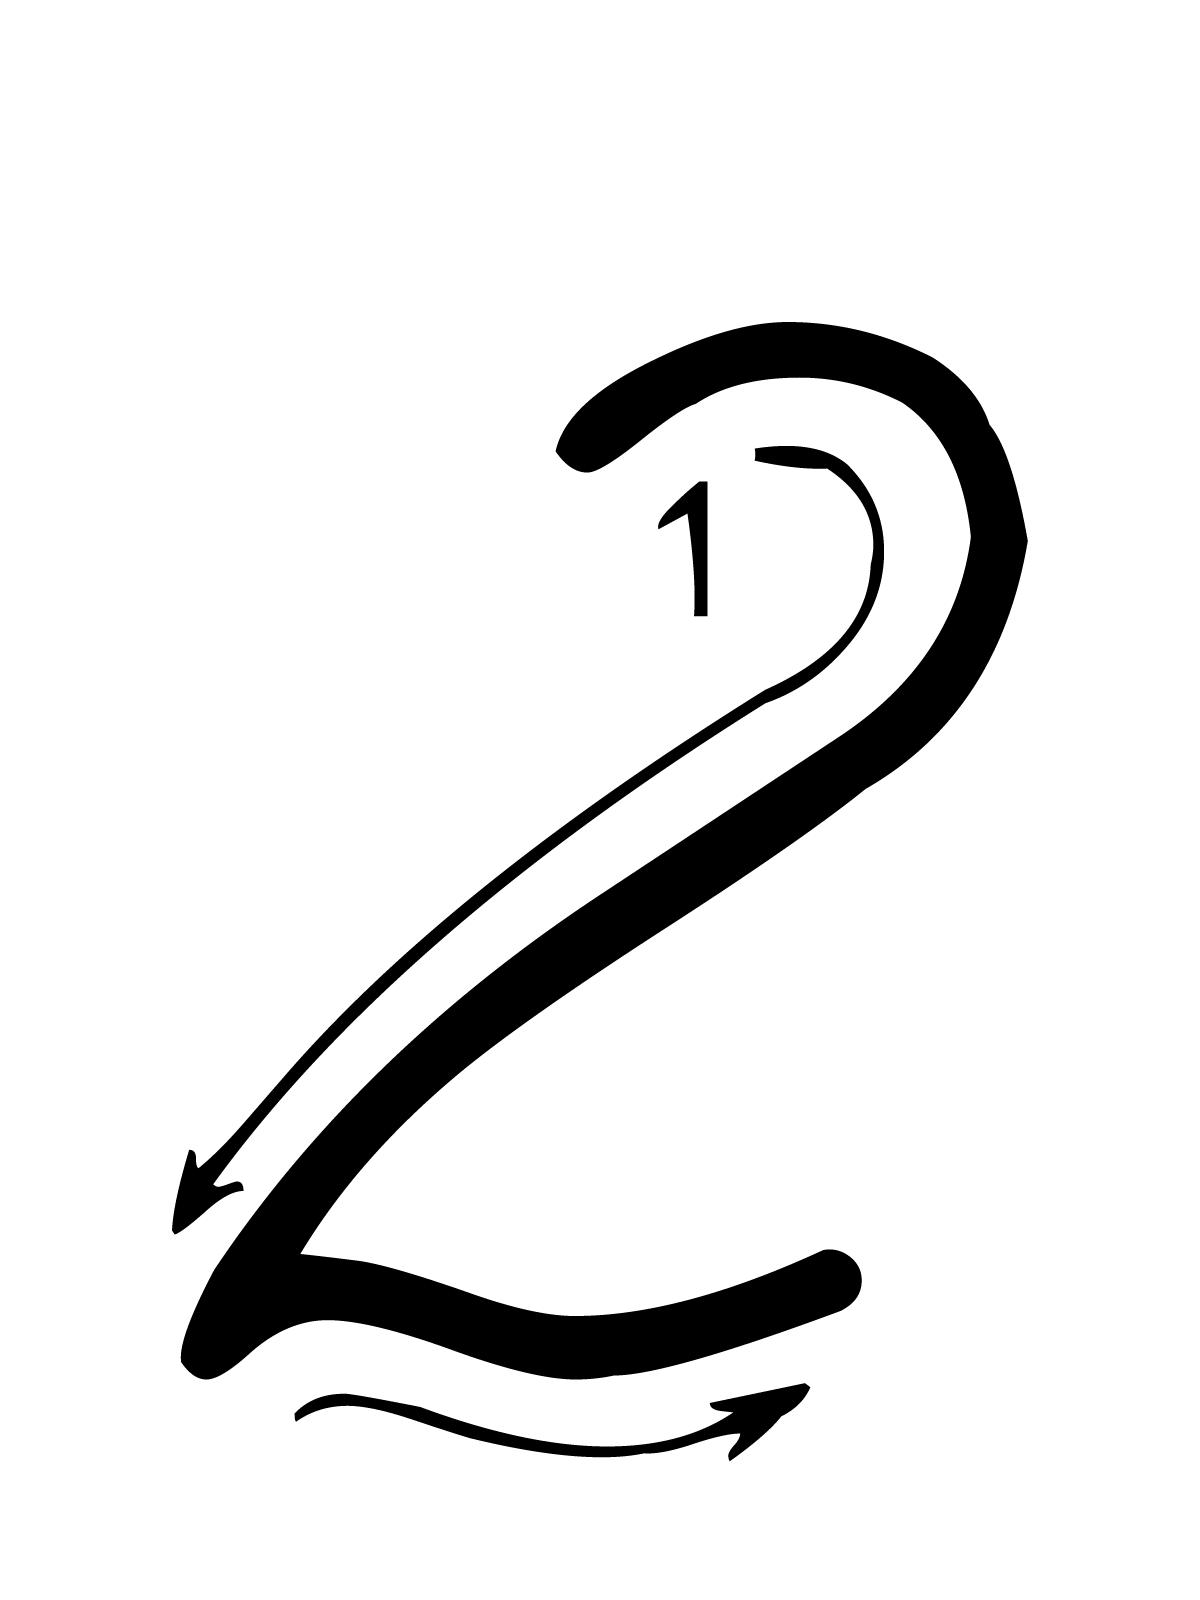 broadband icon png G2